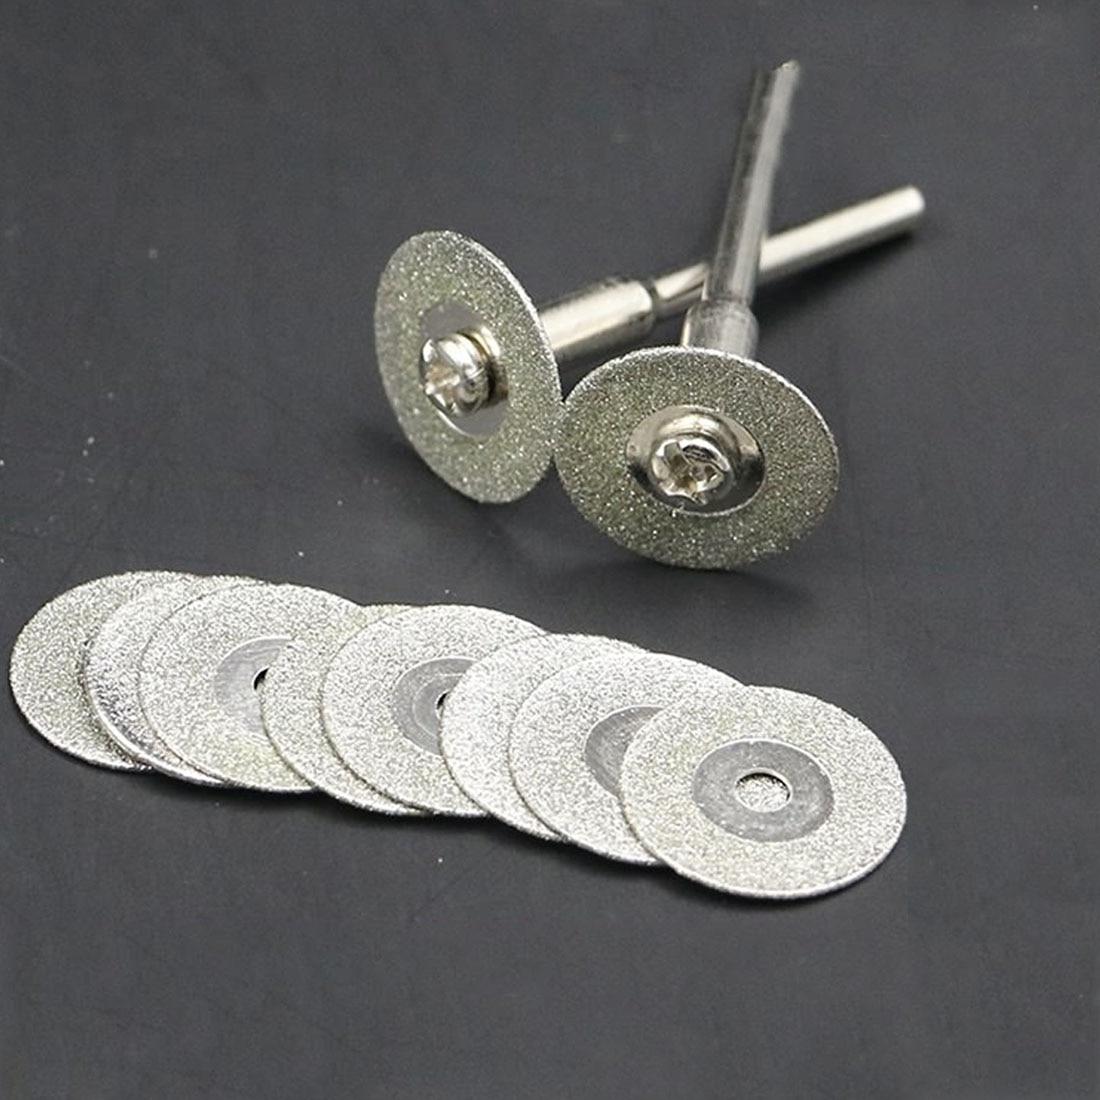 Hot 60mm Diamond Cutting Disc For Mini Drill Dremel Tools Diamond Disc Steel Rotary Tool Circular Saw Abrasive Saw Blade